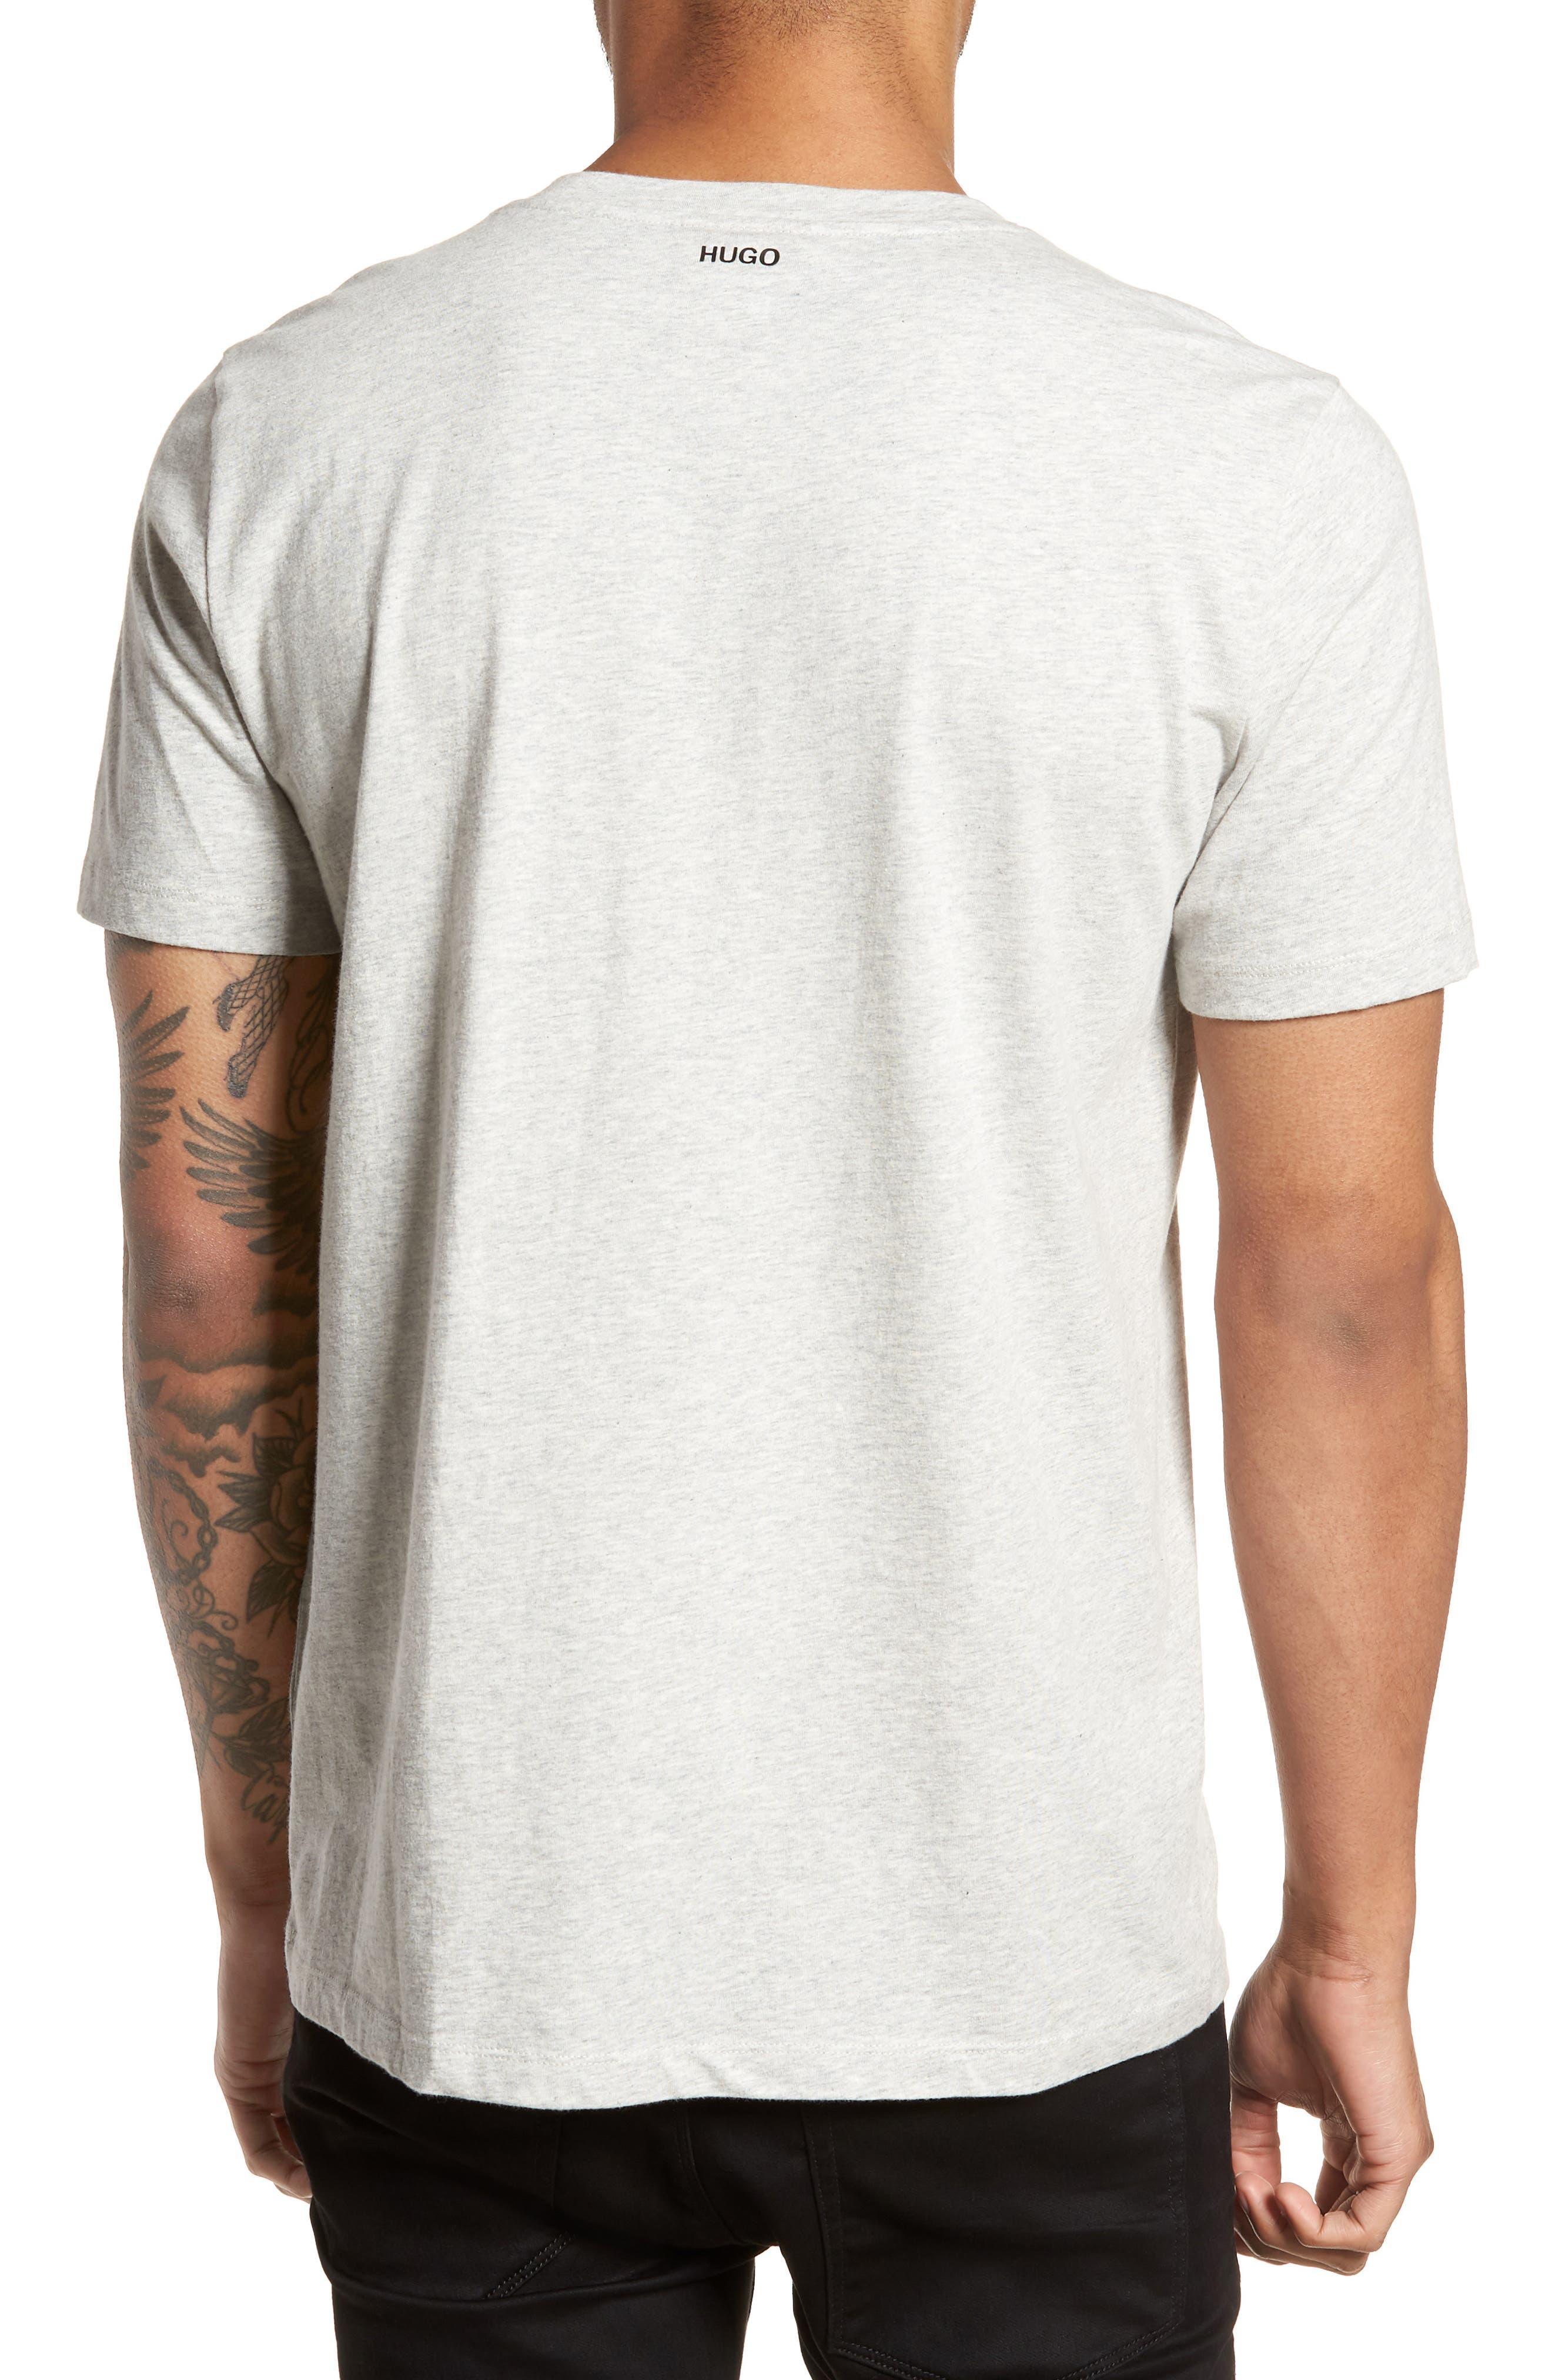 Drush Slim Fit Graphic T-Shirt,                             Alternate thumbnail 2, color,                             061